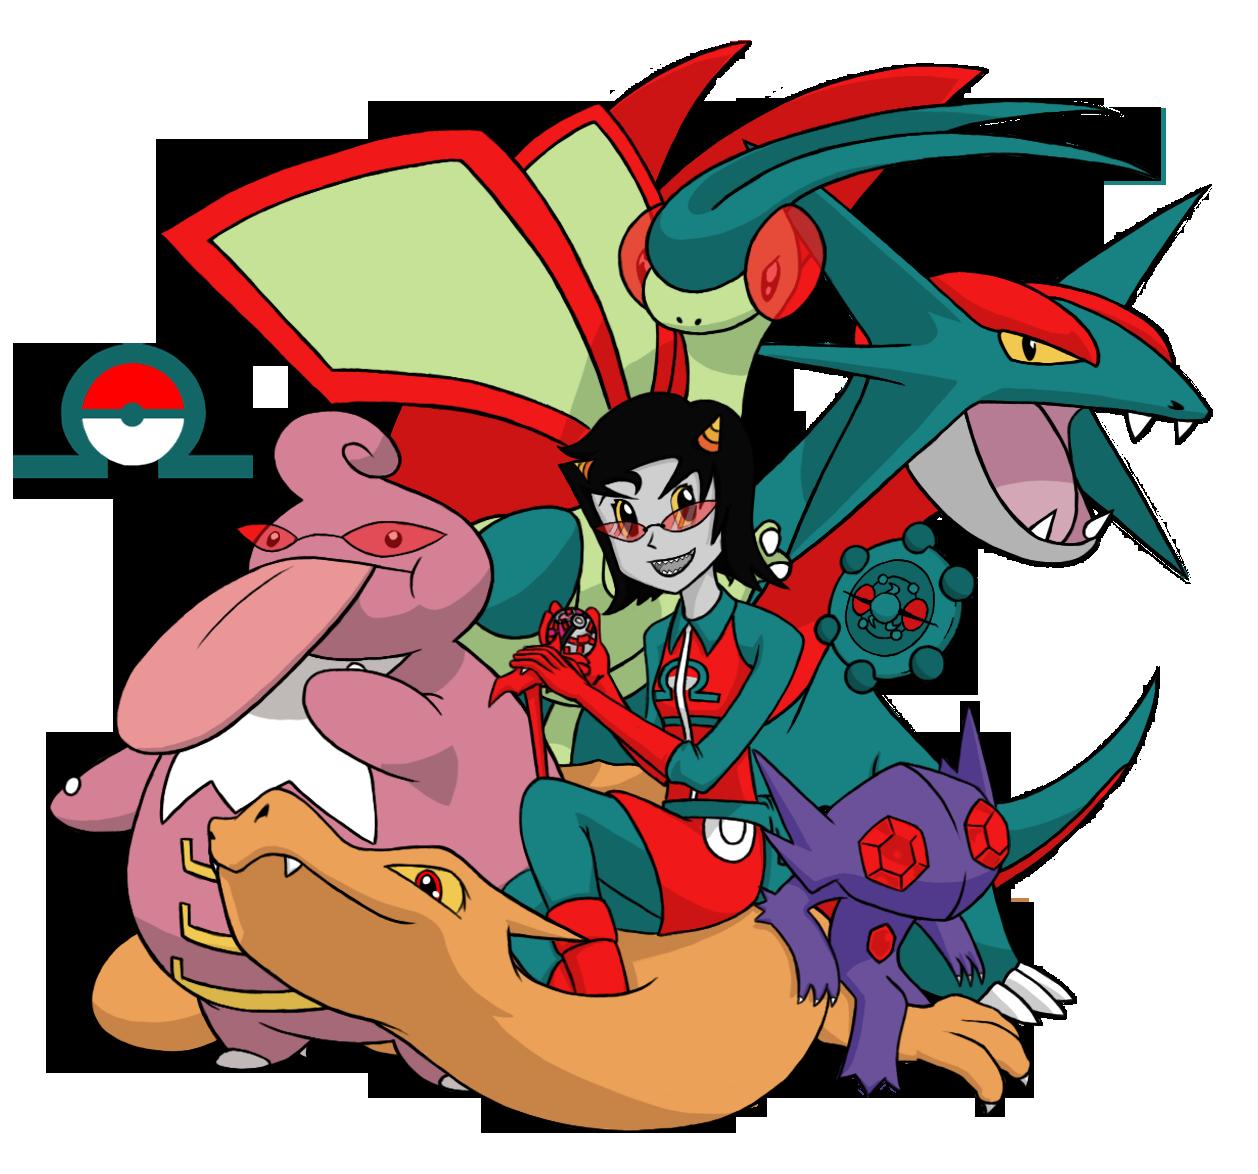 Homestuck-Pokémon Crossover Part 2 - Terezi